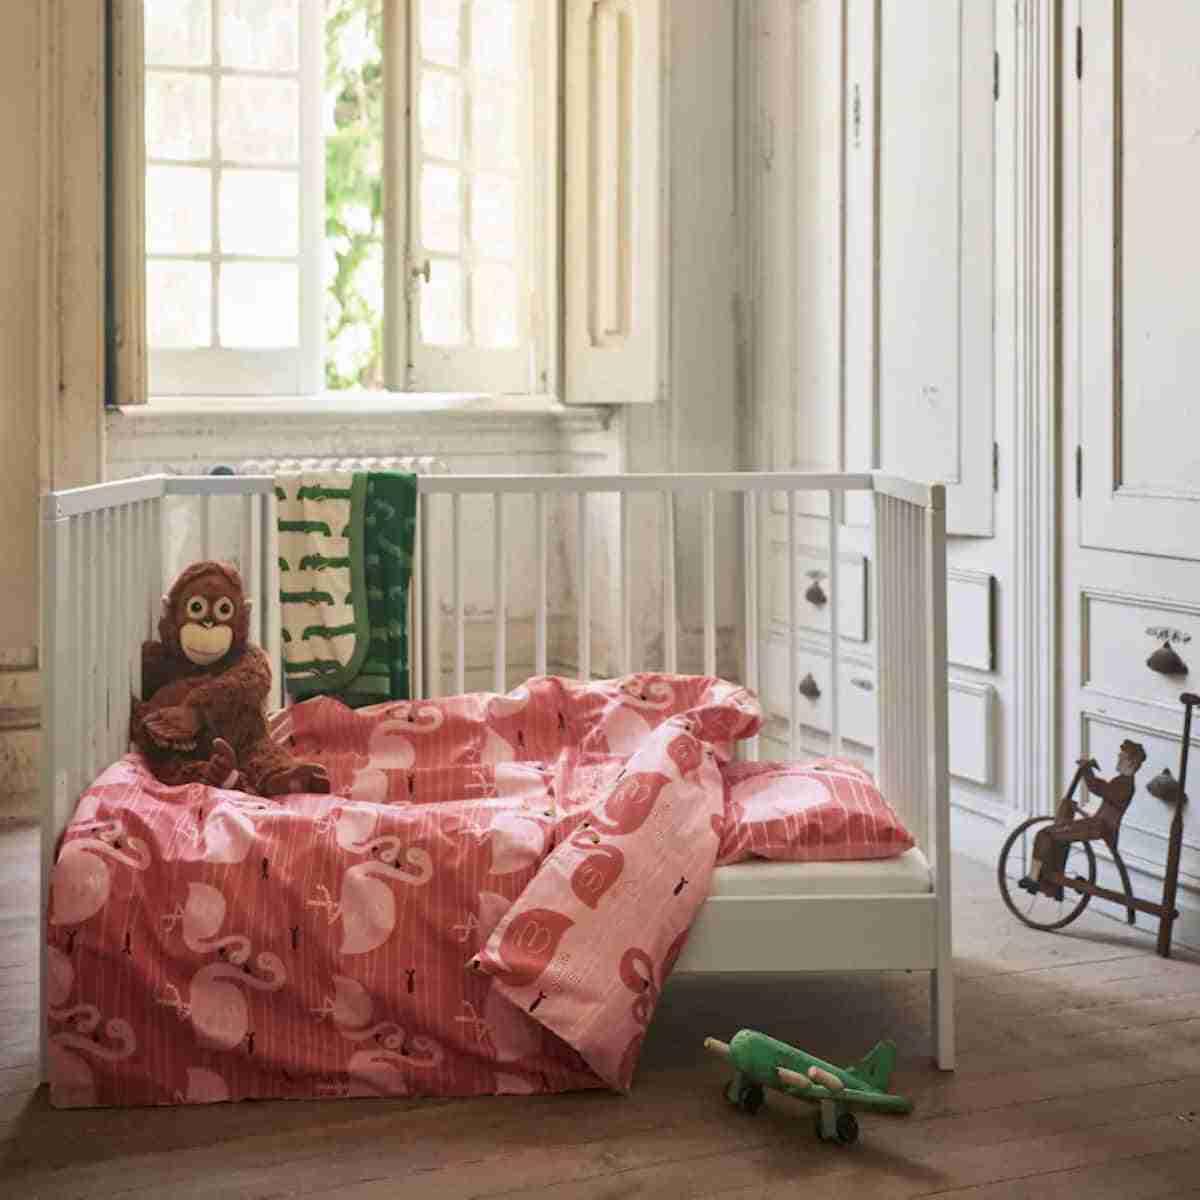 dormitorio de bebe con textiles ikea